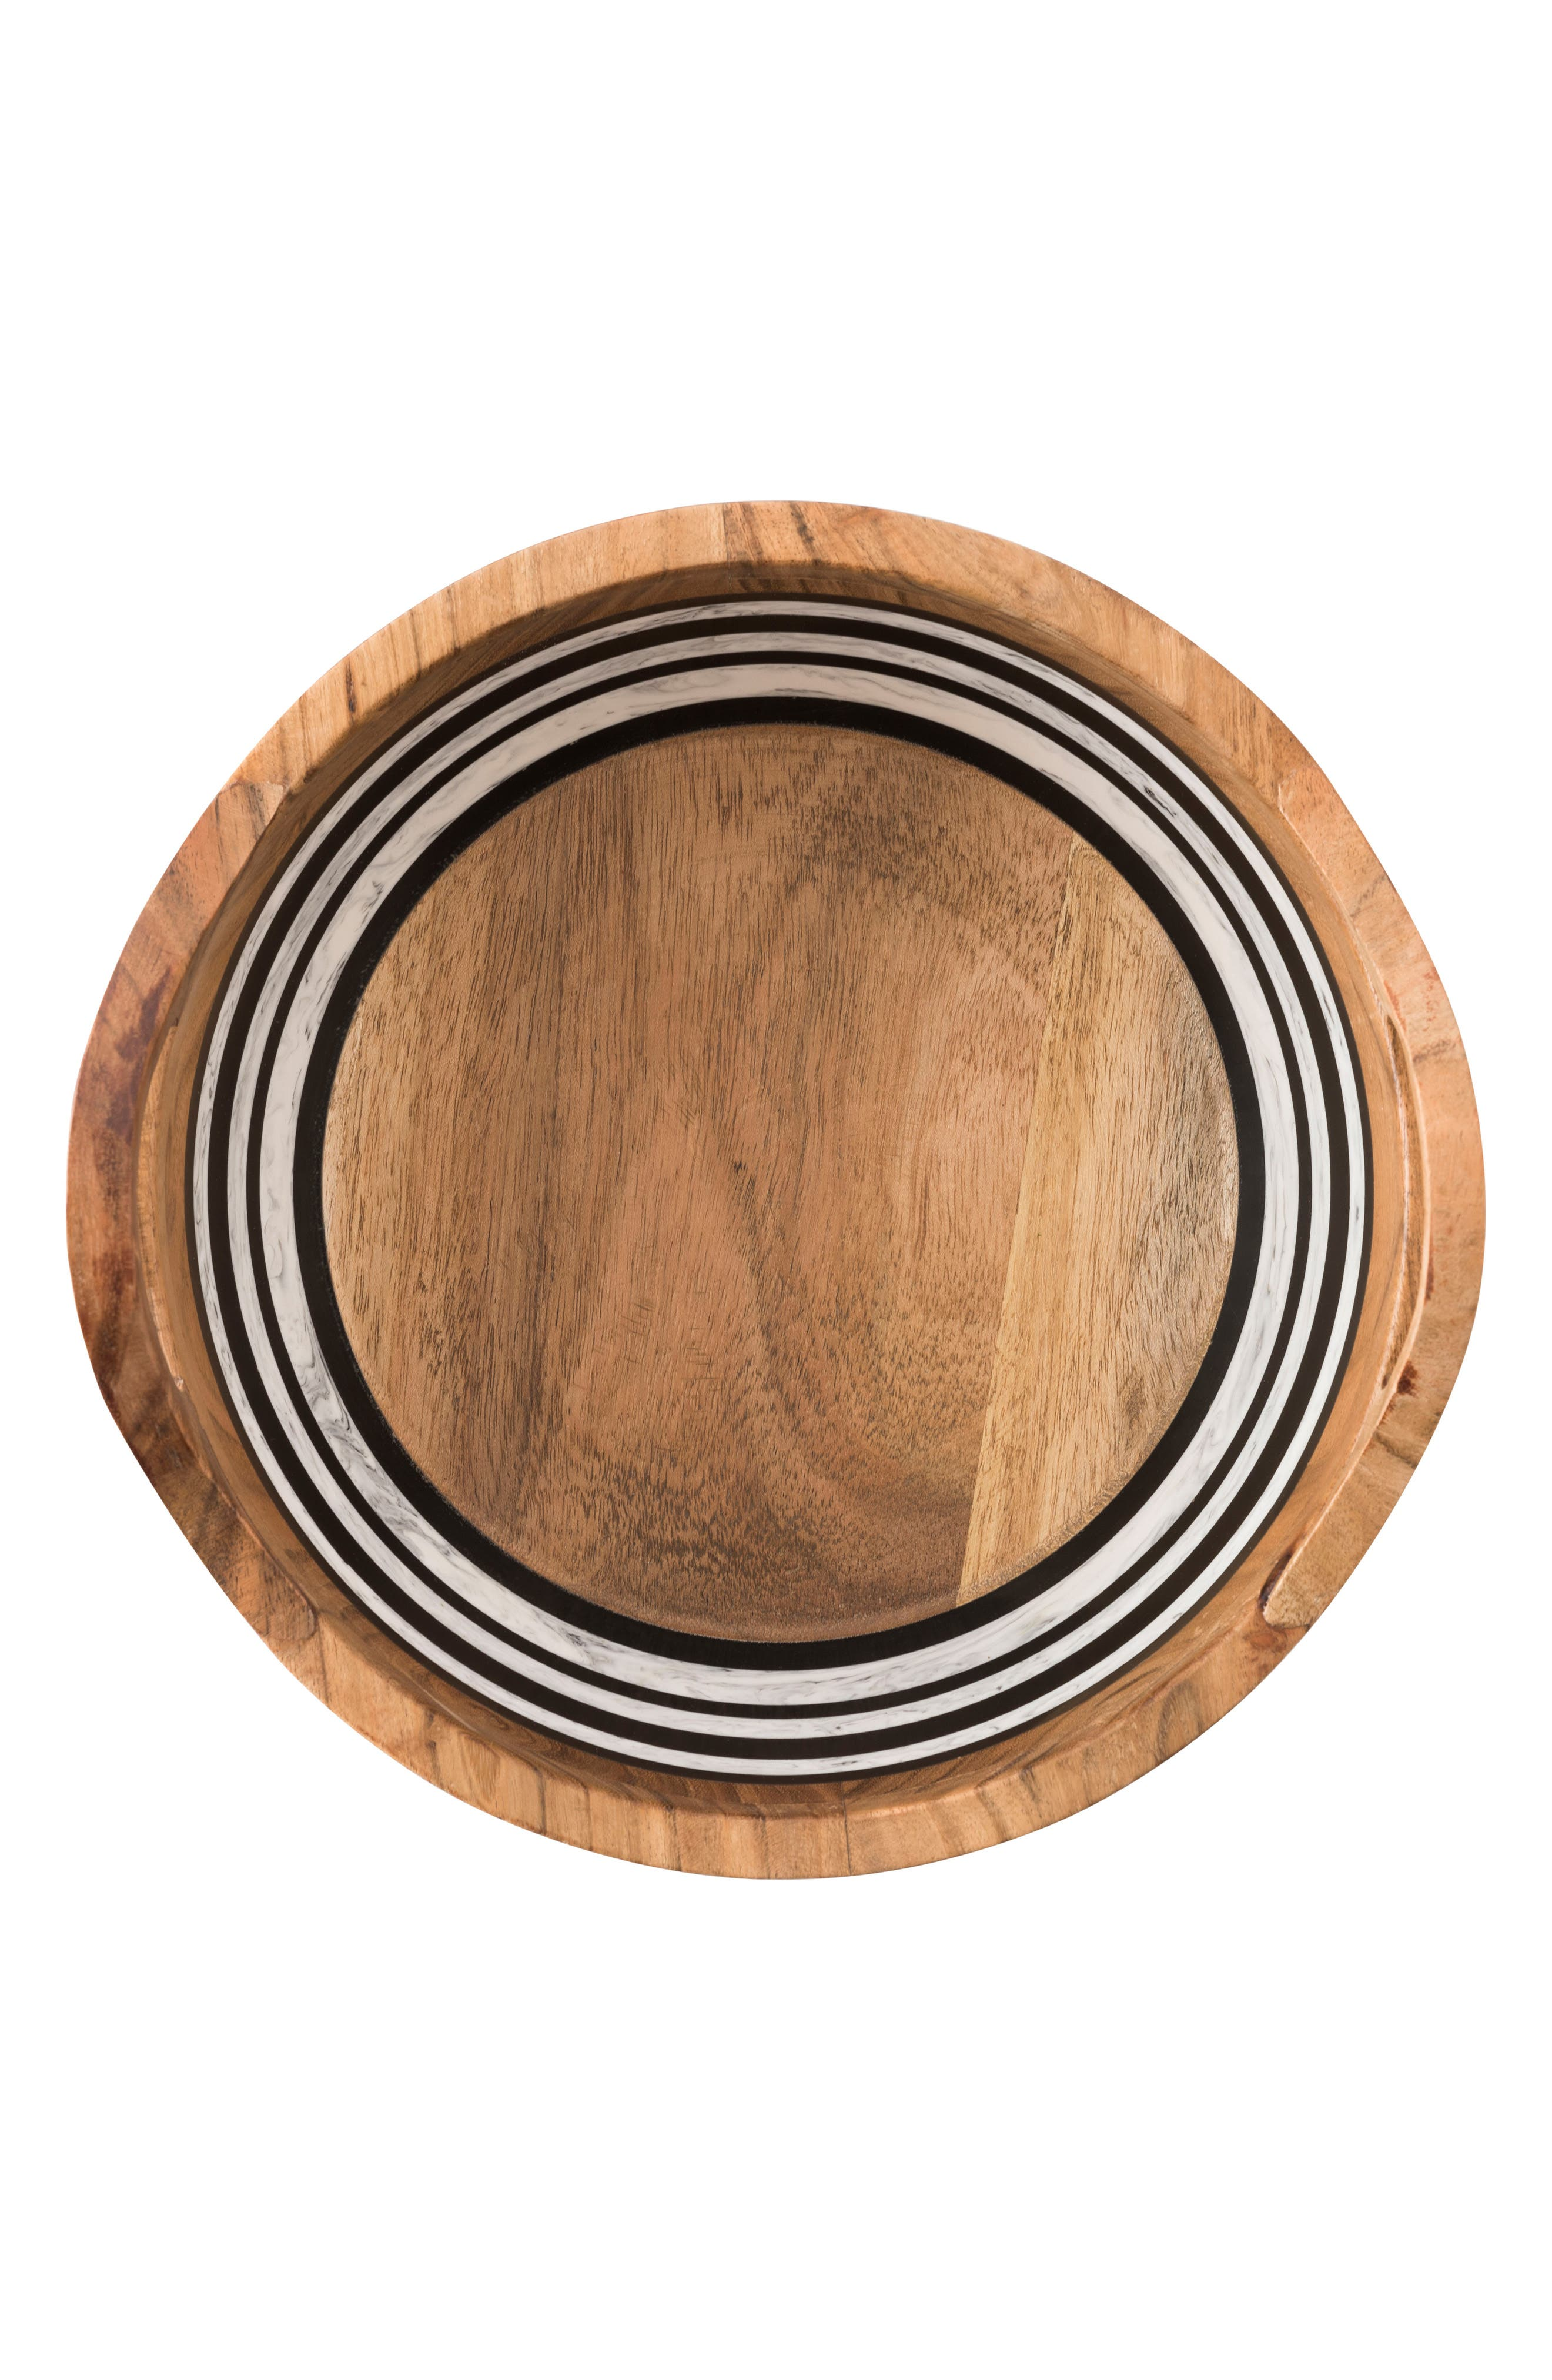 Stonewood Stripe Round Serving Bowl,                             Alternate thumbnail 2, color,                             Natural Stripe